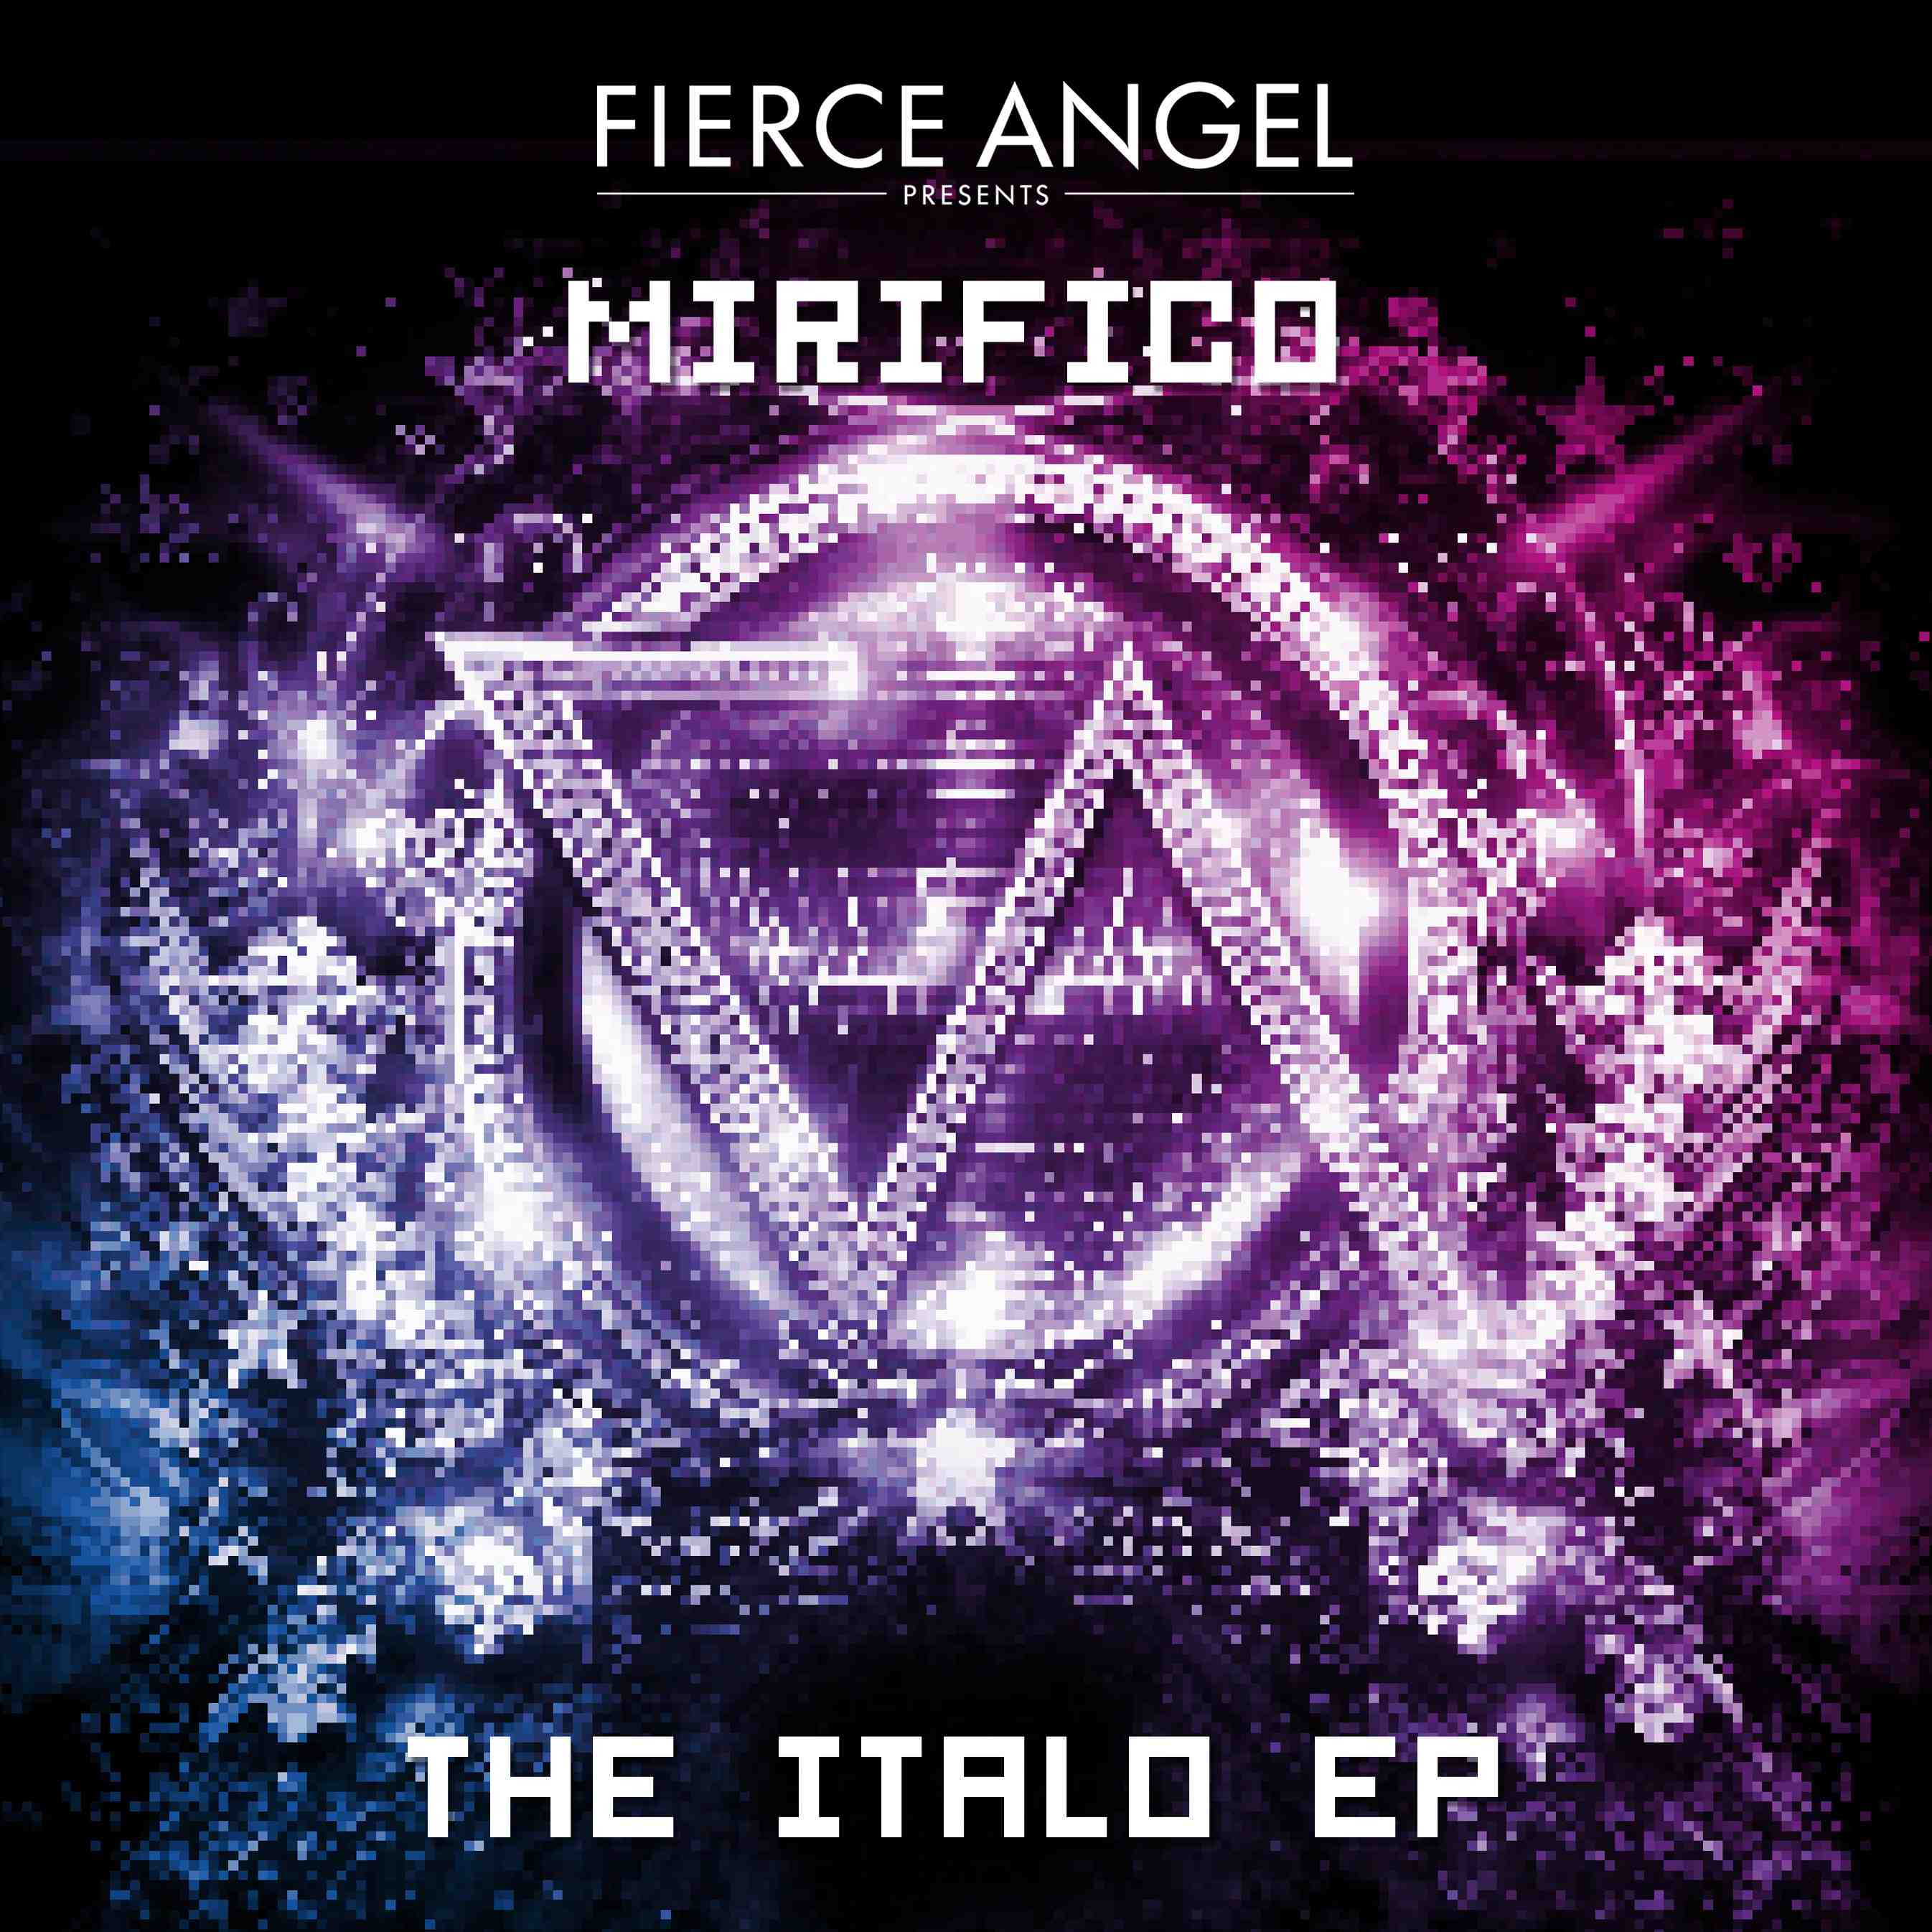 Mirifico - The Italo EP